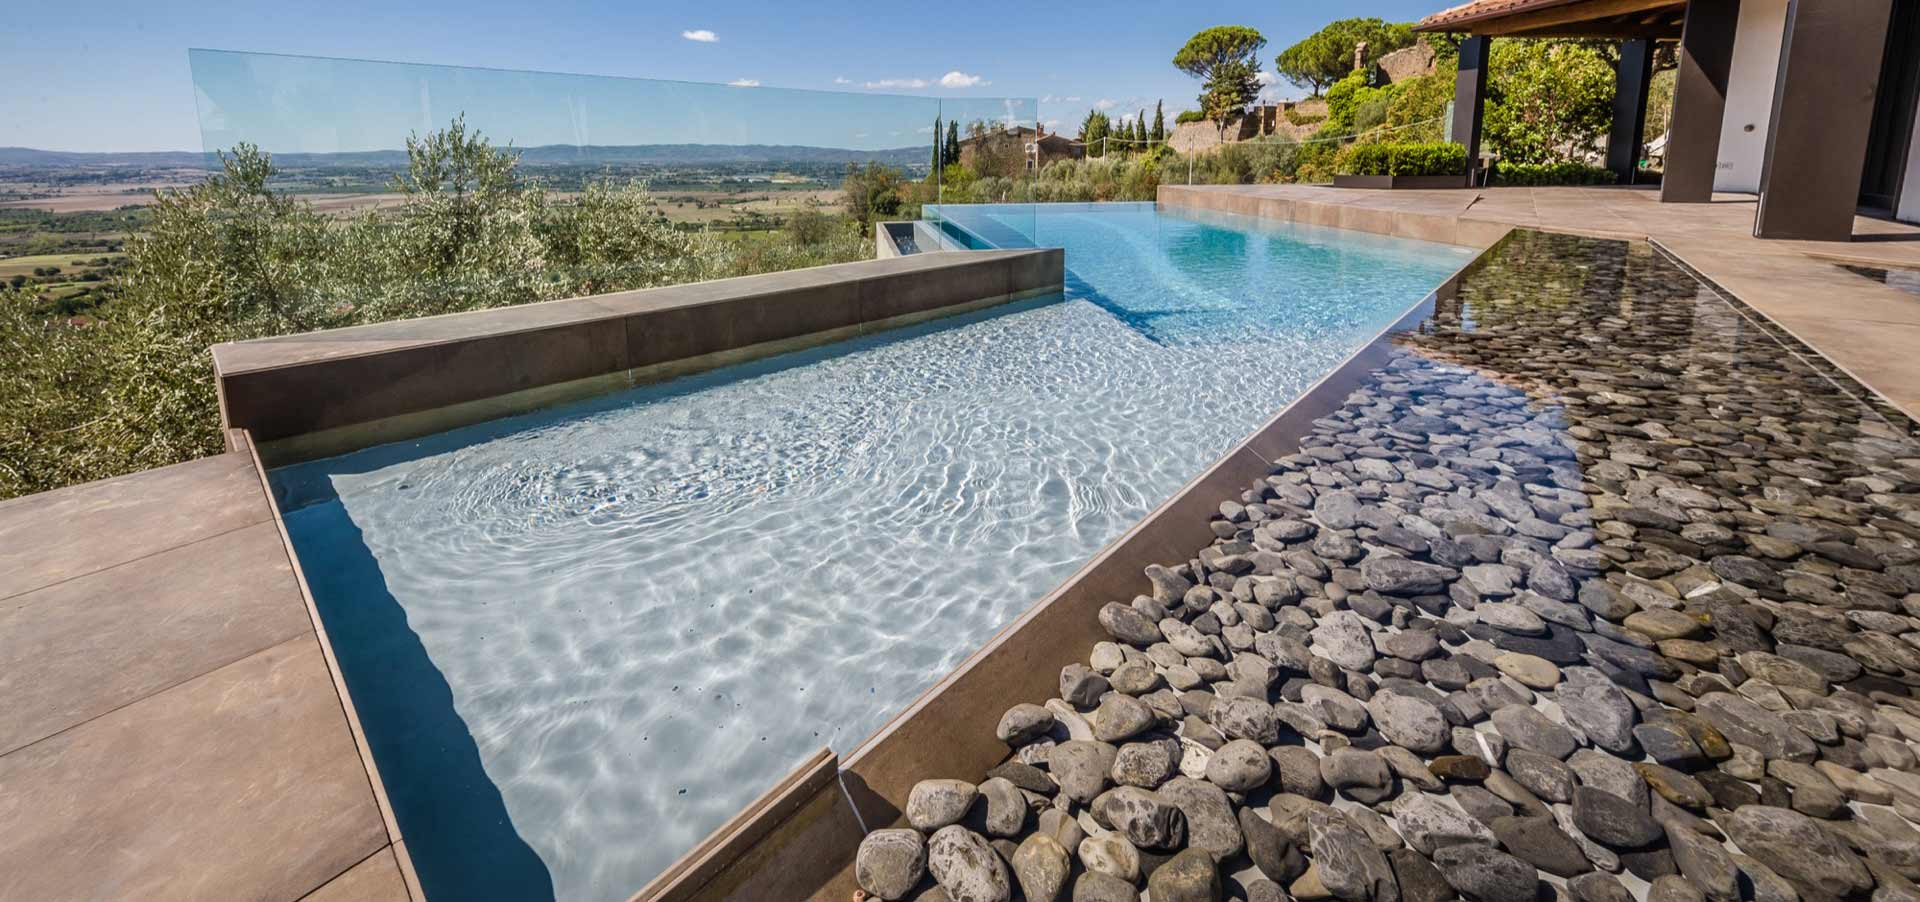 2-piscina-interrata-forme